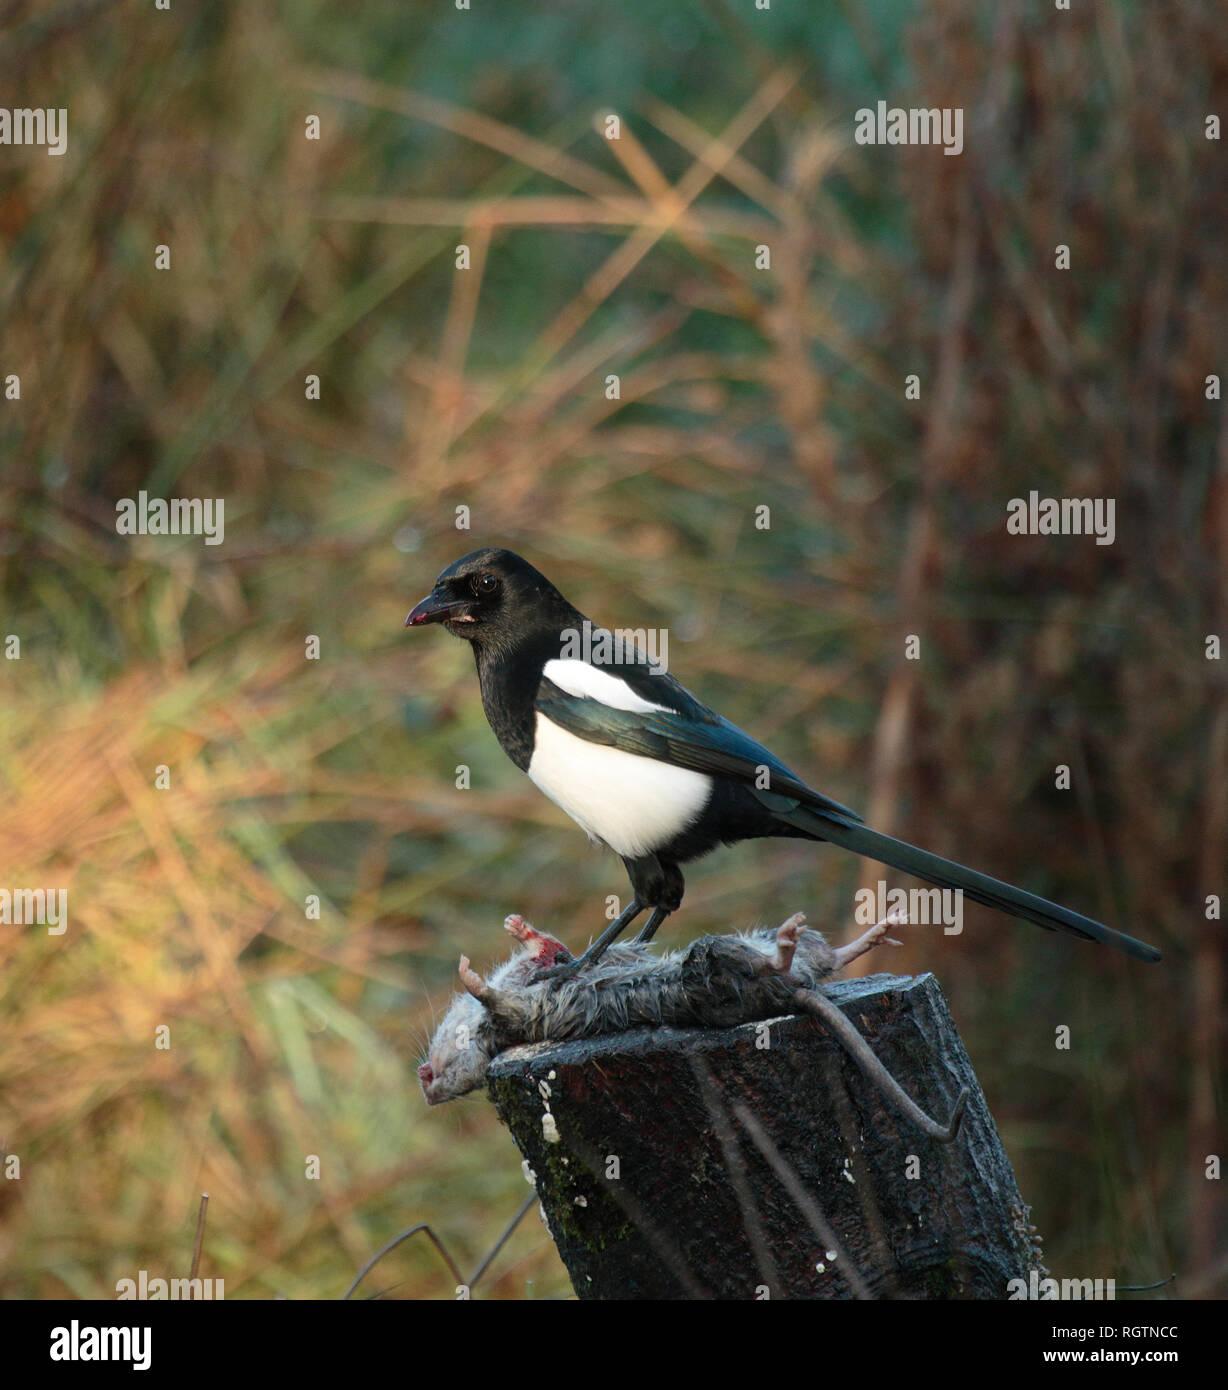 Iridescent Black Birds Stock Photos & Iridescent Black Birds